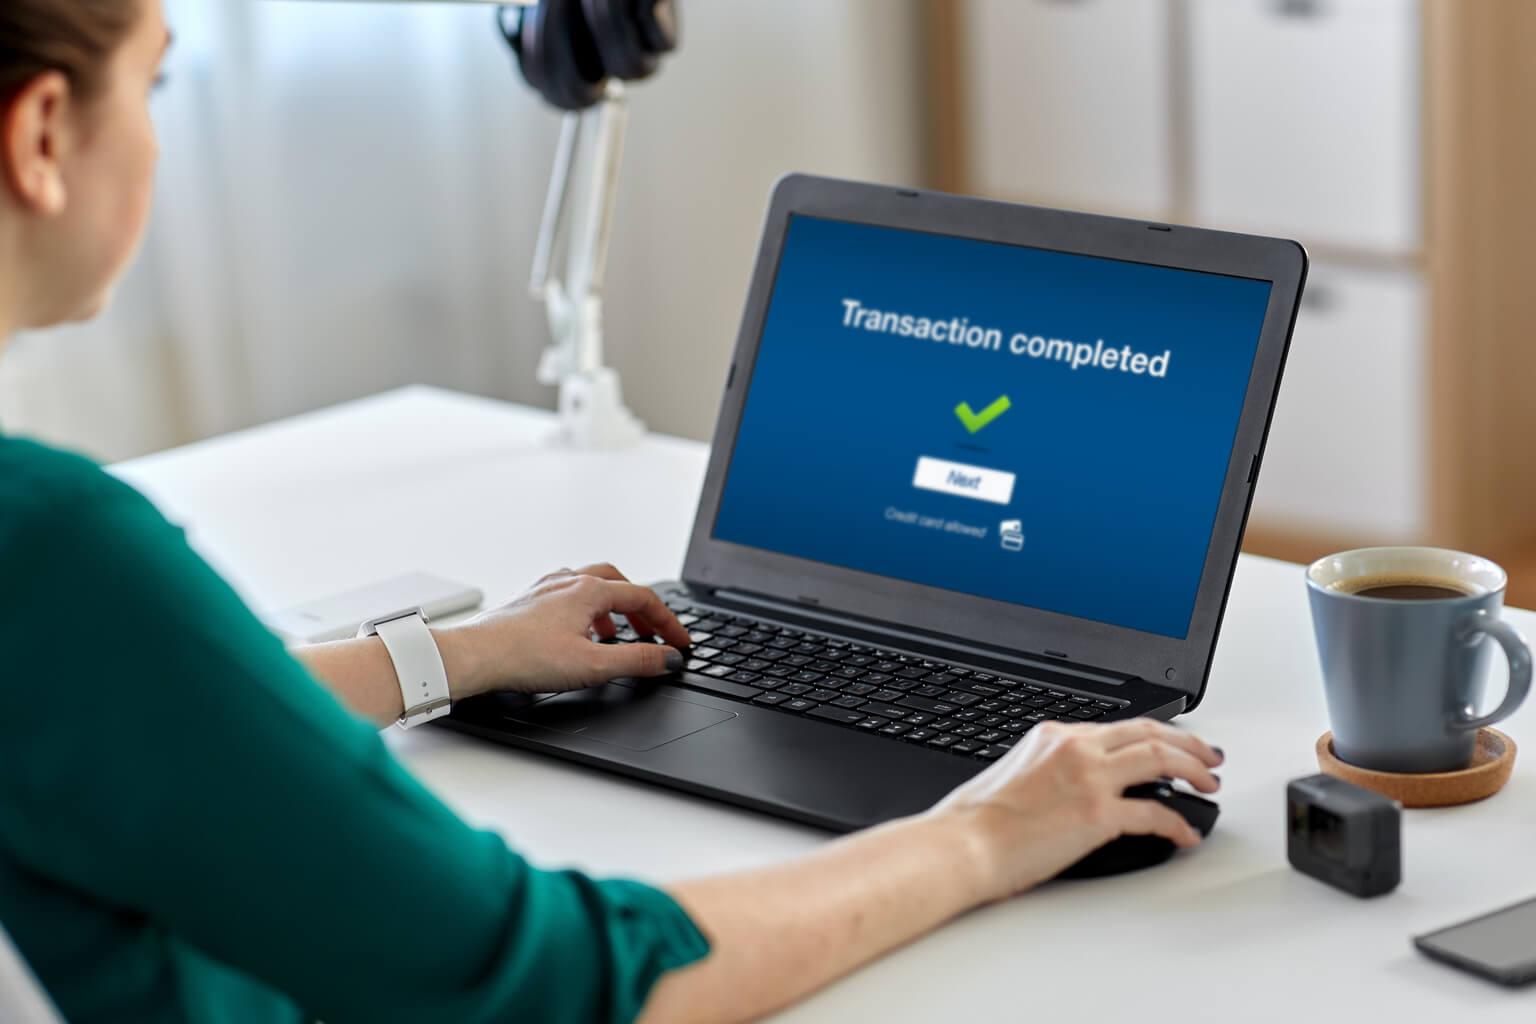 tax-preparer-software-card-benefit-3-1536x1024